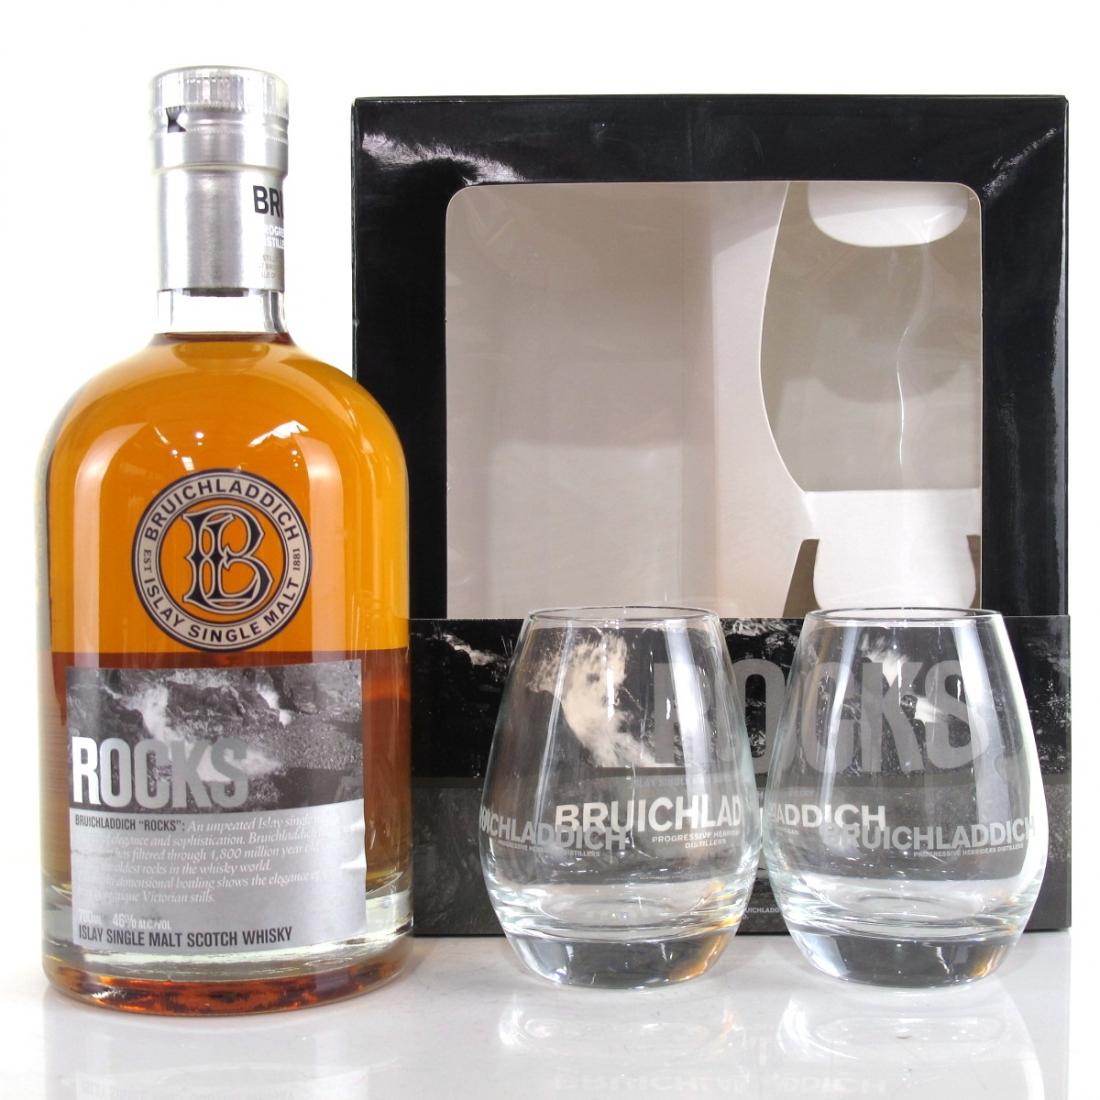 Bruichladdich Rocks 2nd Edition / with 2 x Glasses